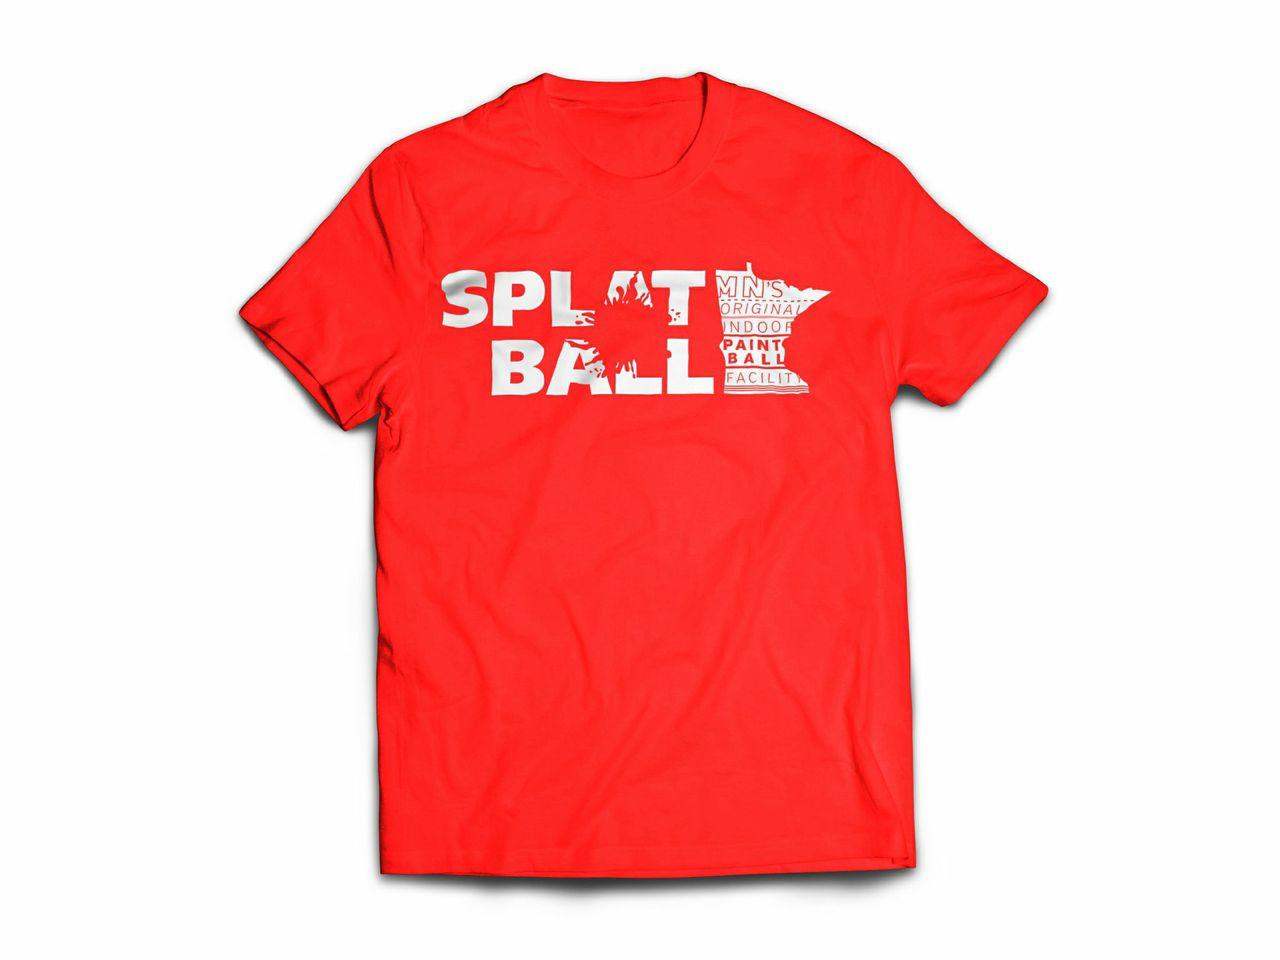 Splatball T Shirt New Design Splatball Indoor Paintball